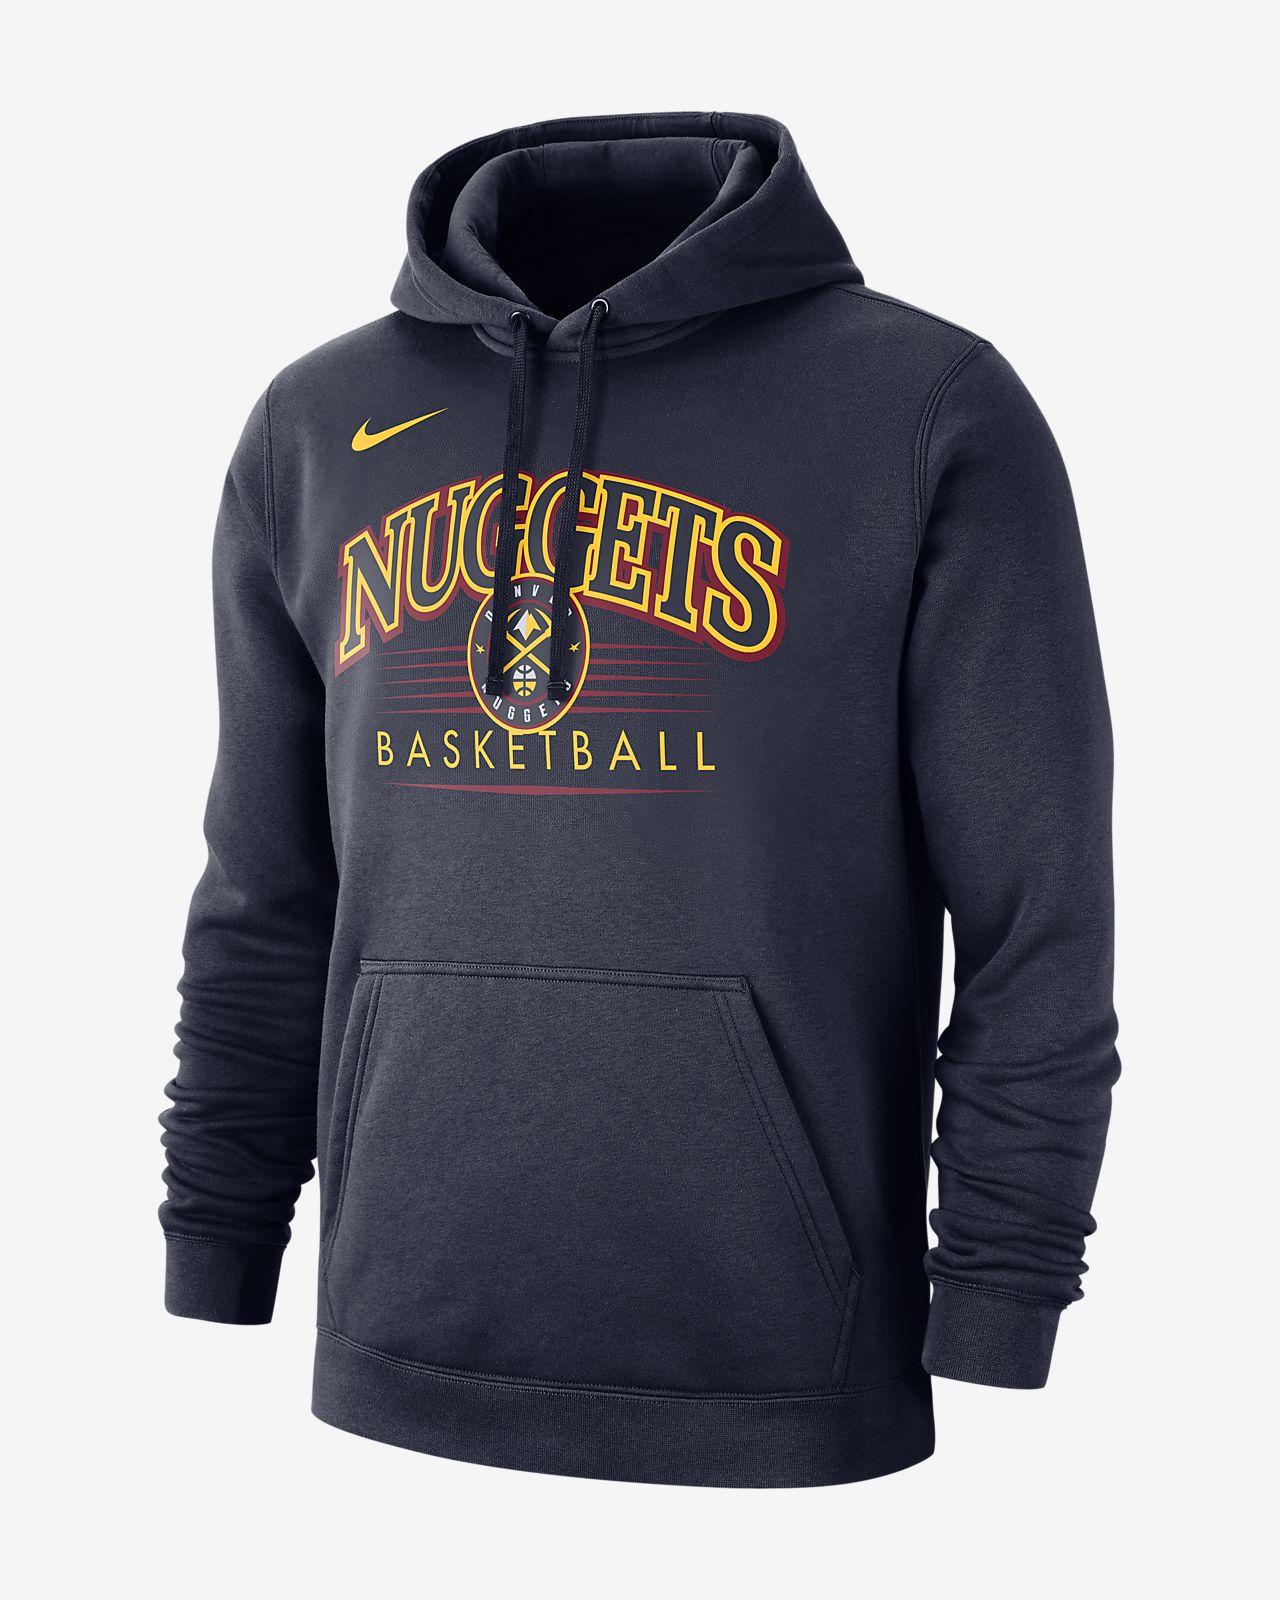 Denver Nuggets Nike NBA-Hoodie für Herren